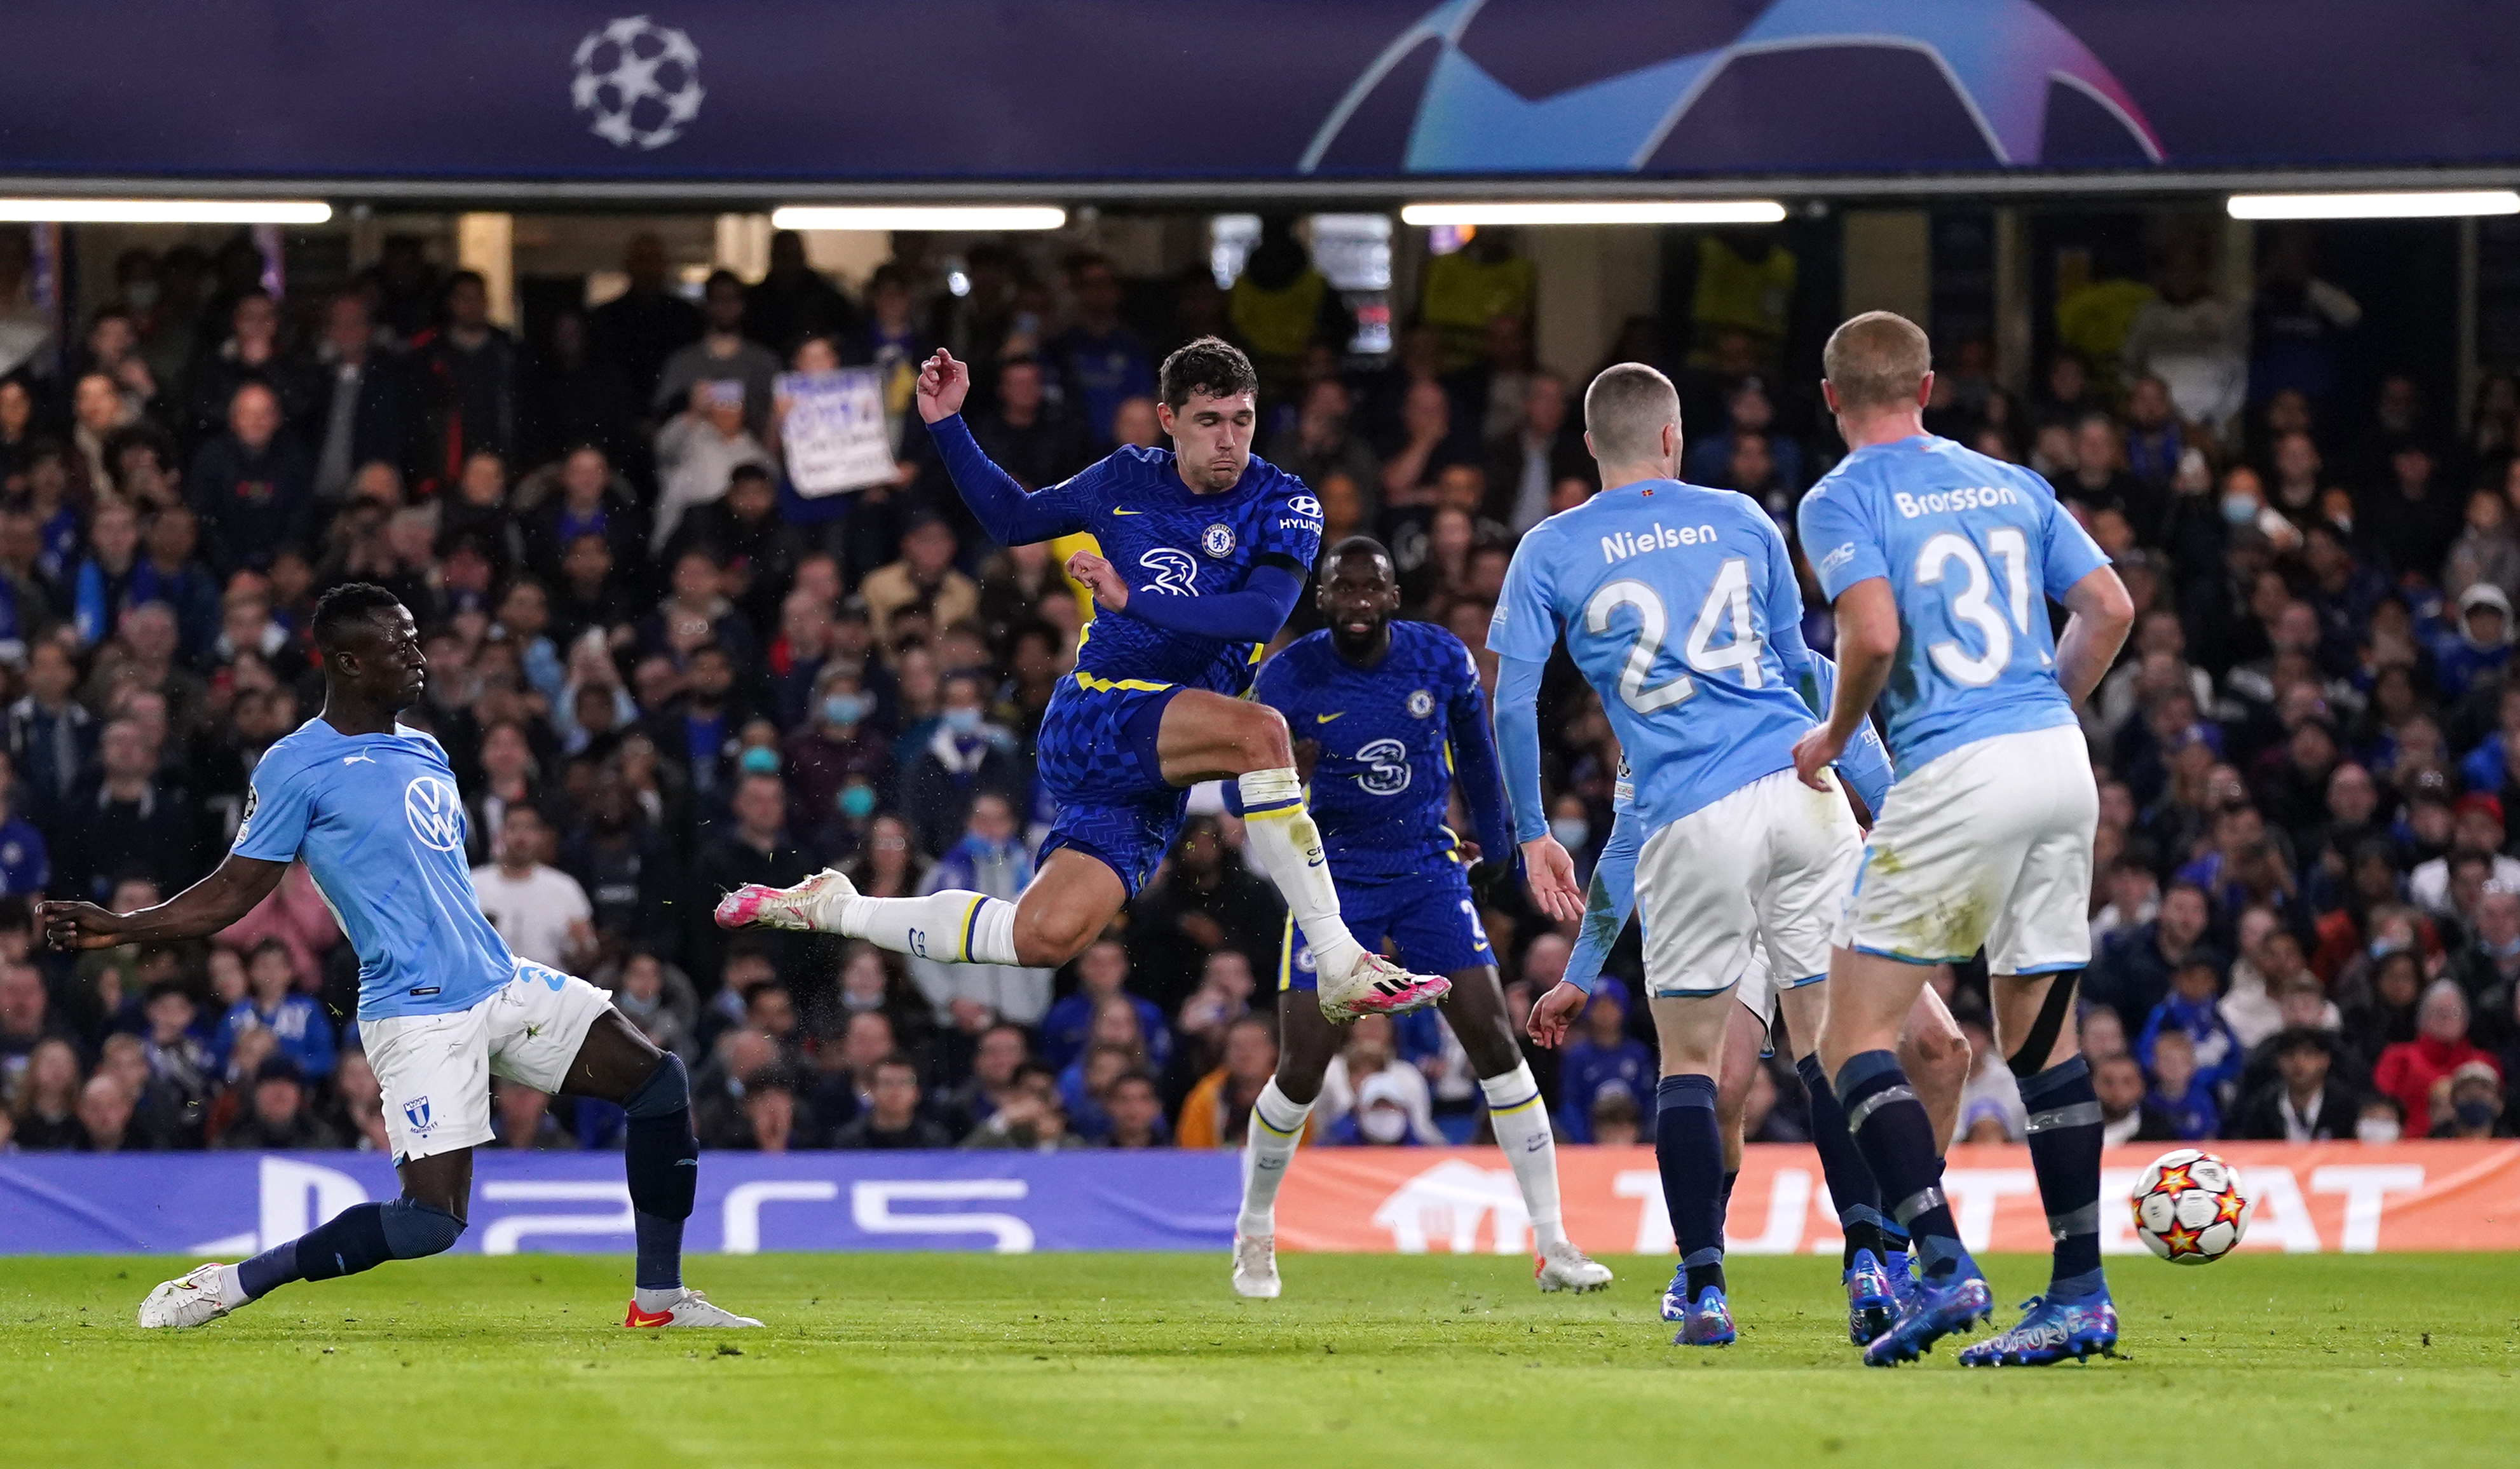 Chelsea v Malmo FF - UEFA Champions League - Group H - Stamford Bridge